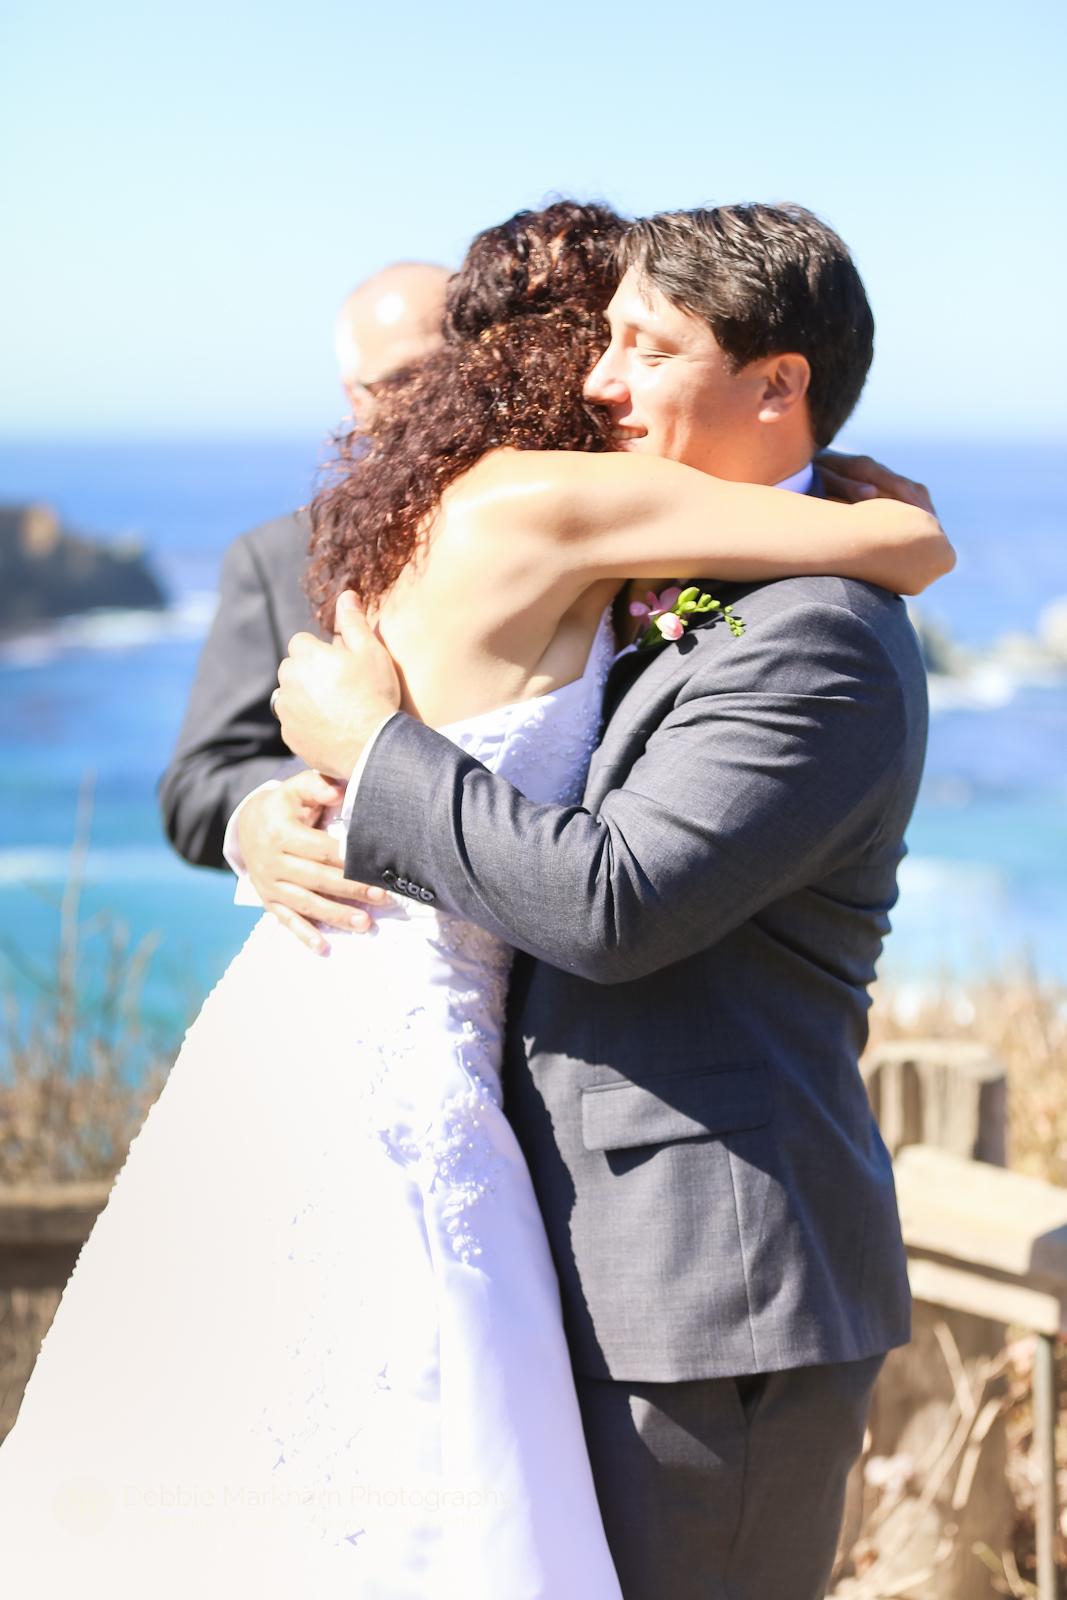 destination-wedding_small-wedding_big-sur_california-coast_ocean-view_gorda_wedding-photographer_debbie-markham-8722